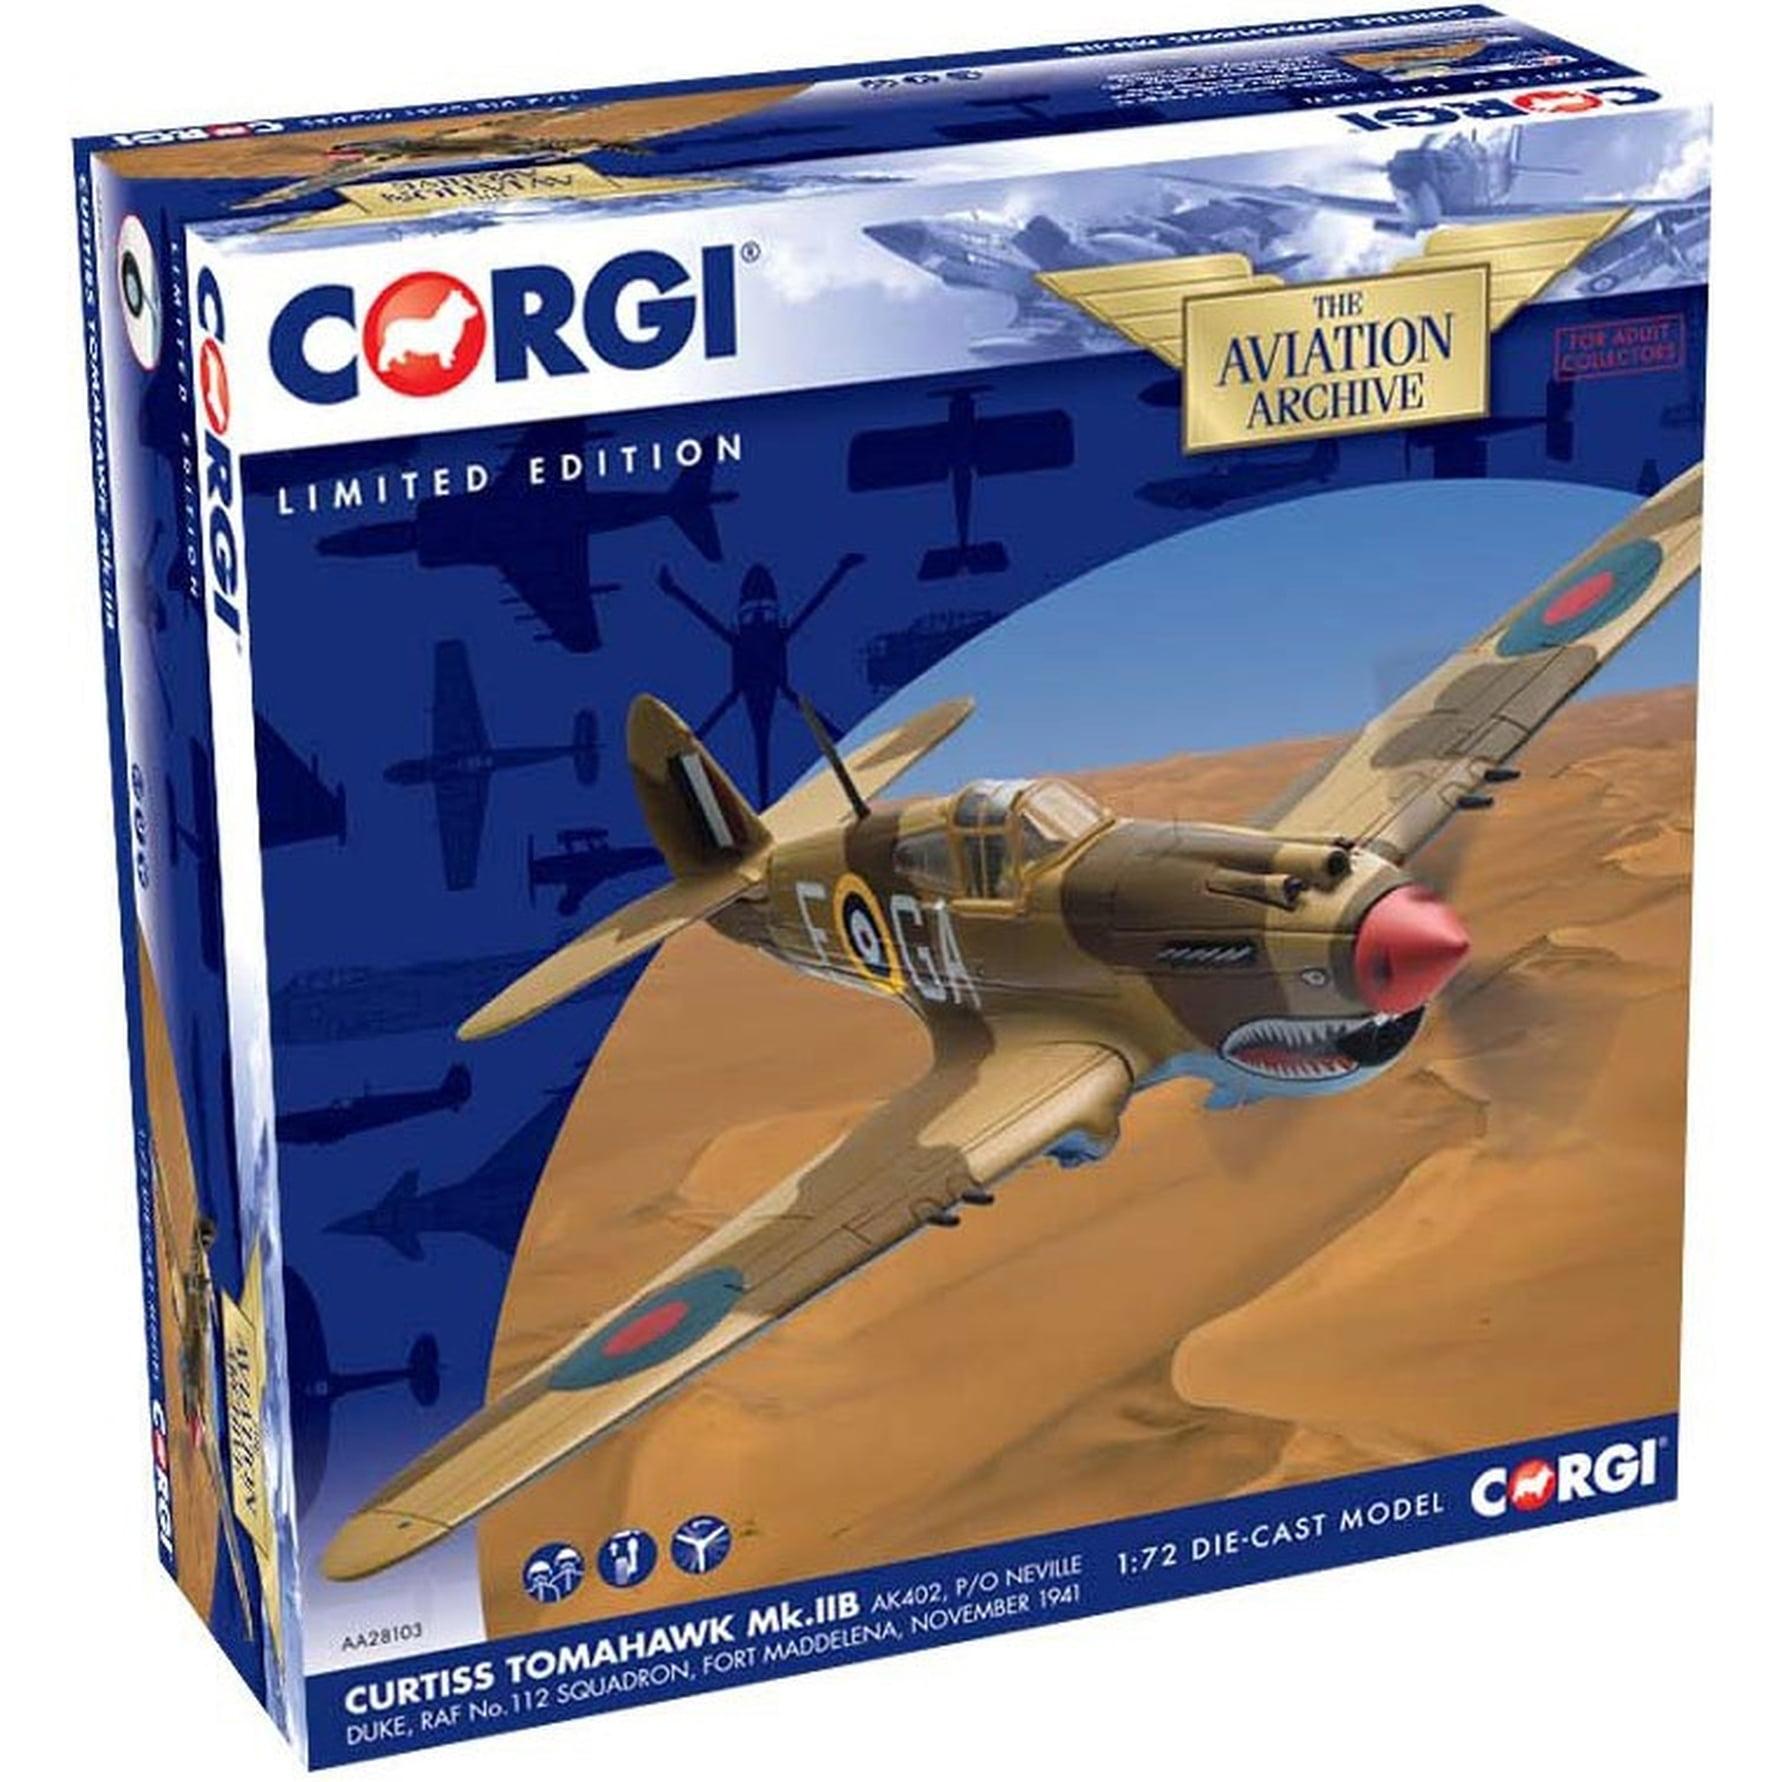 Corgi Curtiss Tomahawk IIB, AK402, P/O Neville Duke, RAF No.112 Squadron